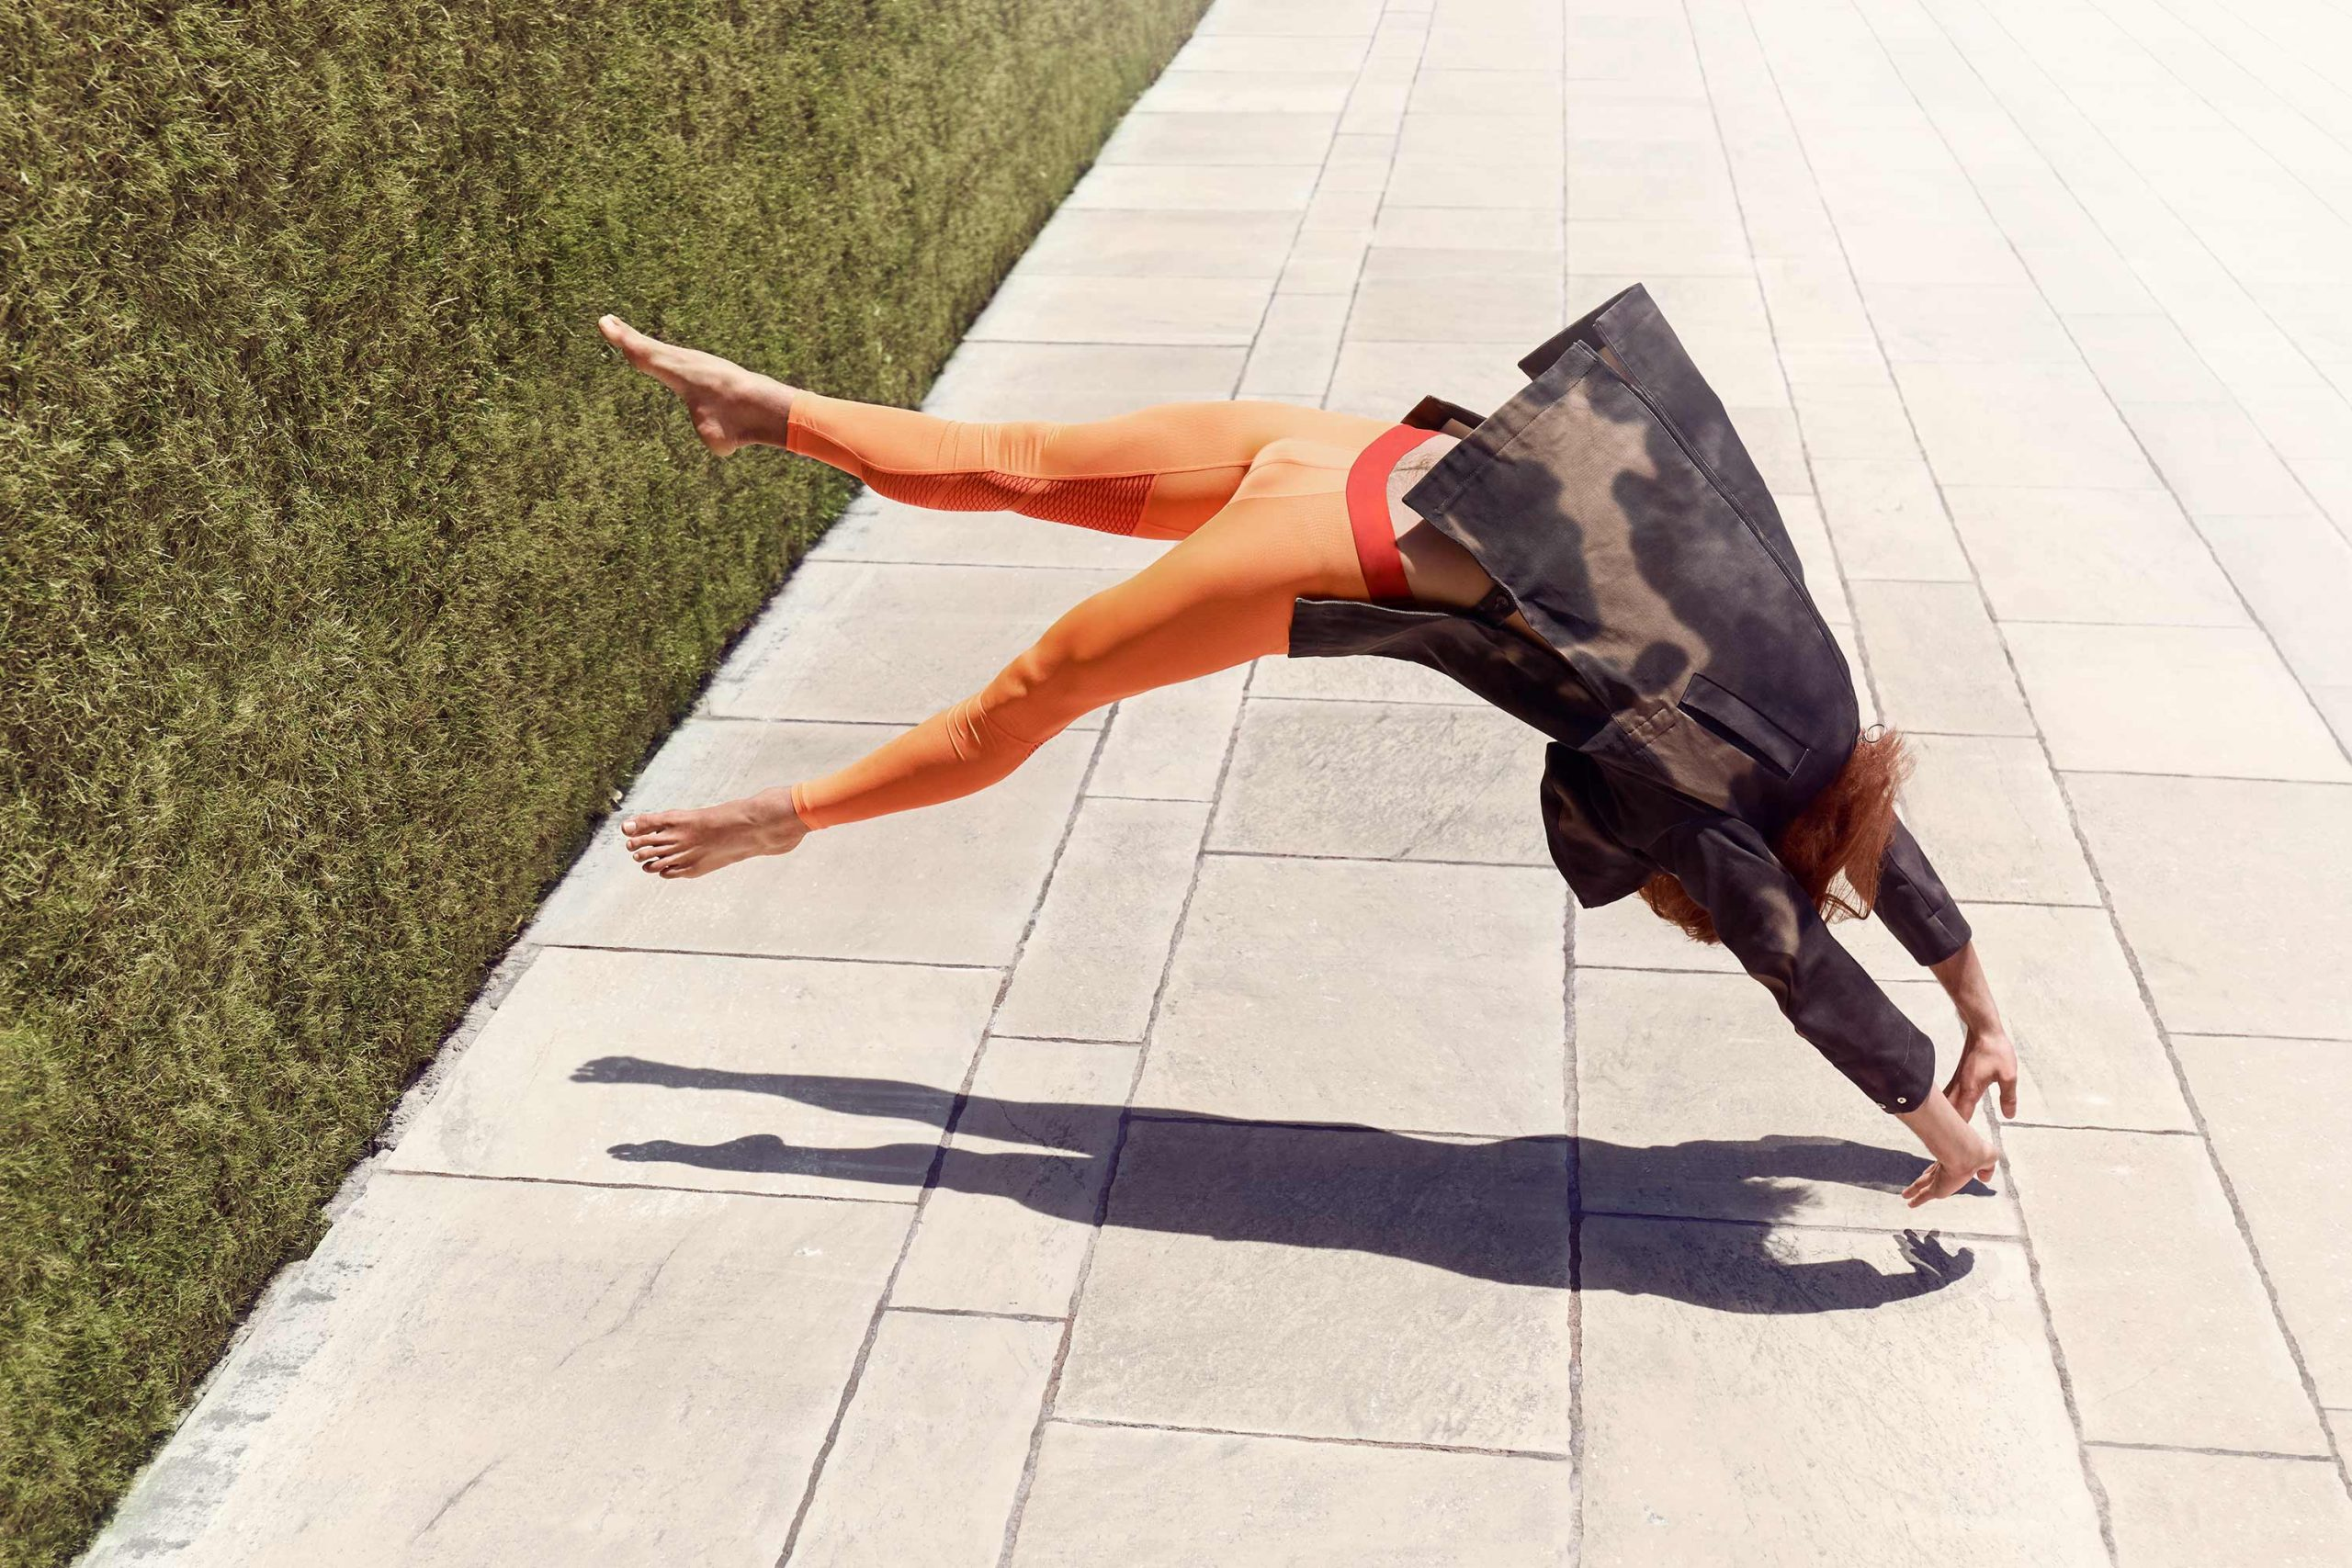 wren-agency-marcus-palmqvist-movement10